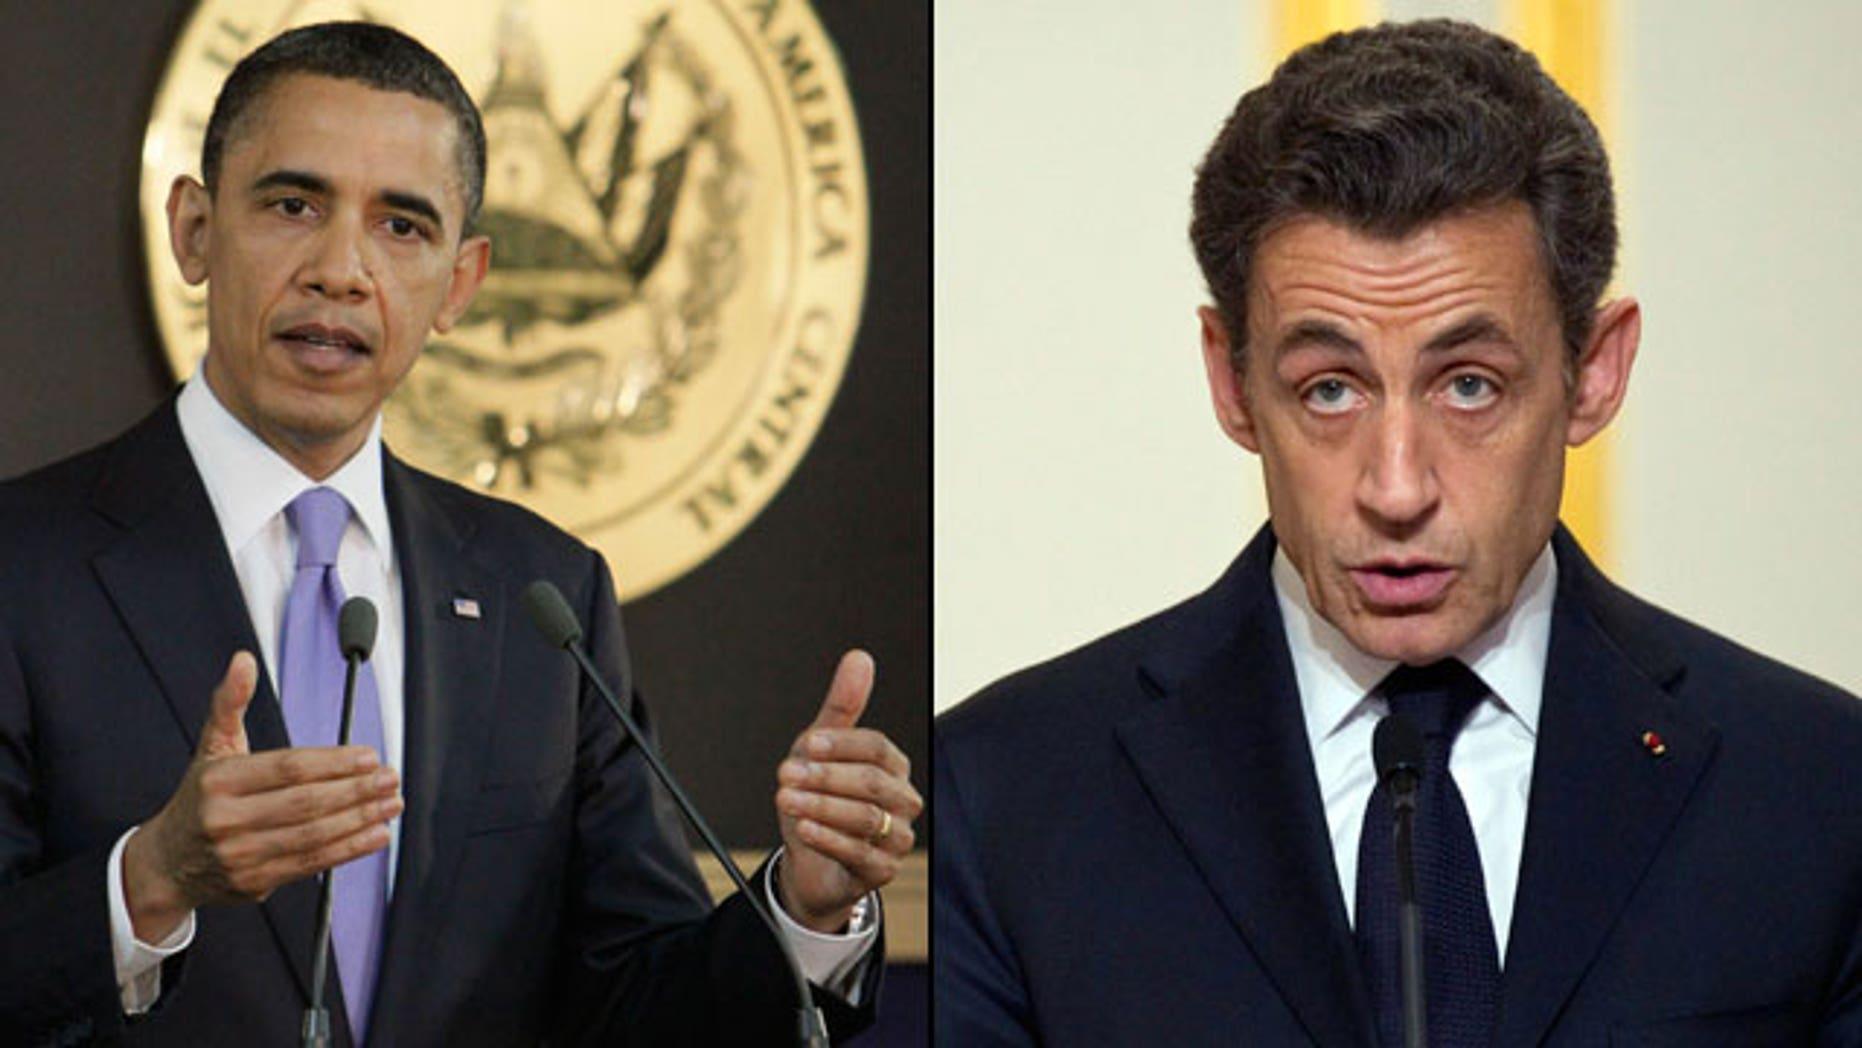 U.S. President Obama and French President Nicolas Sarkozy. (AP)